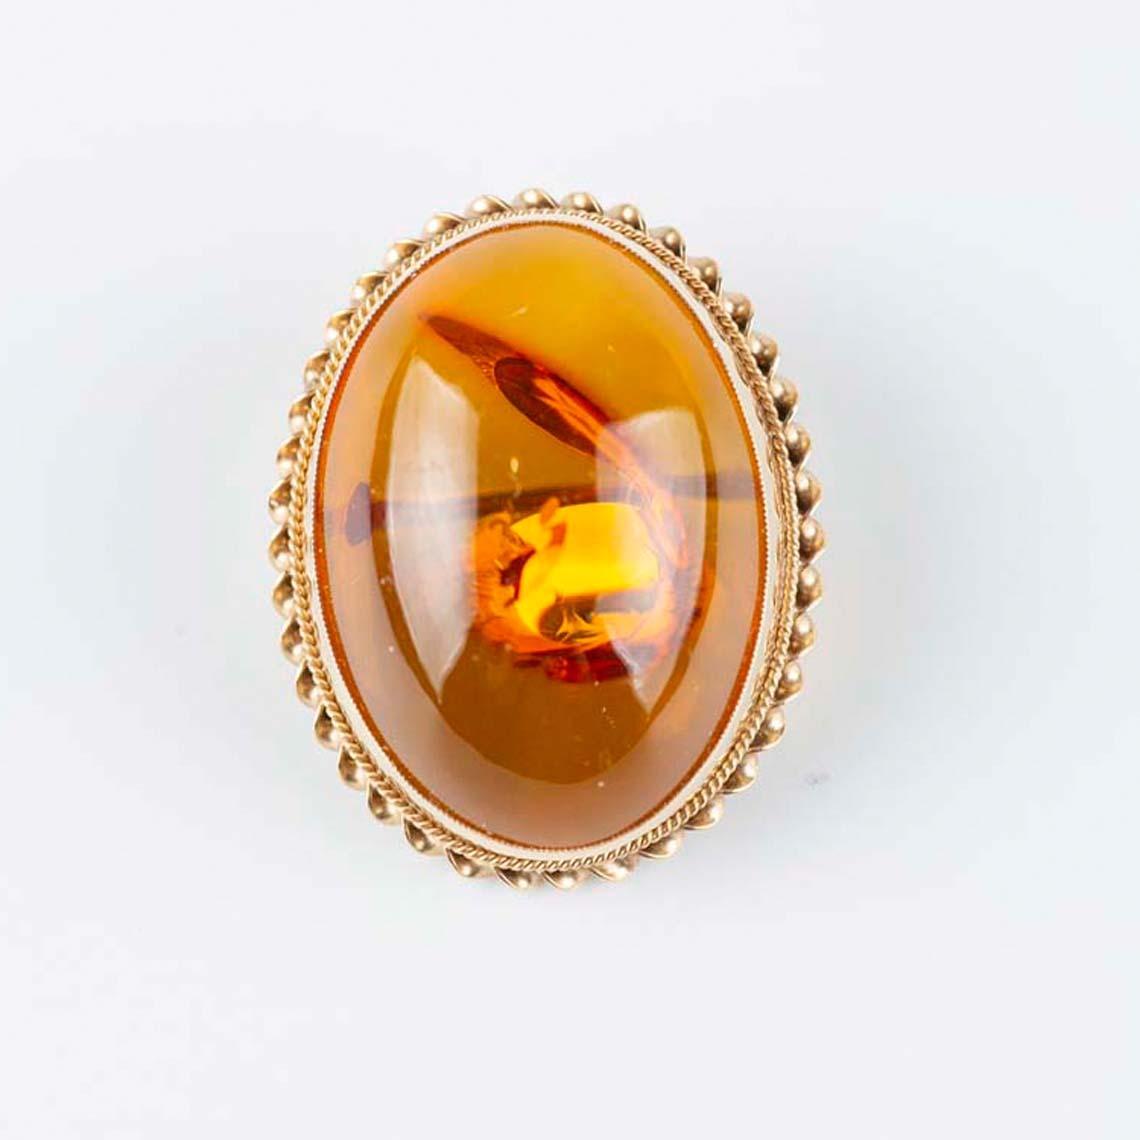 9ct Yellow Gold Brooch